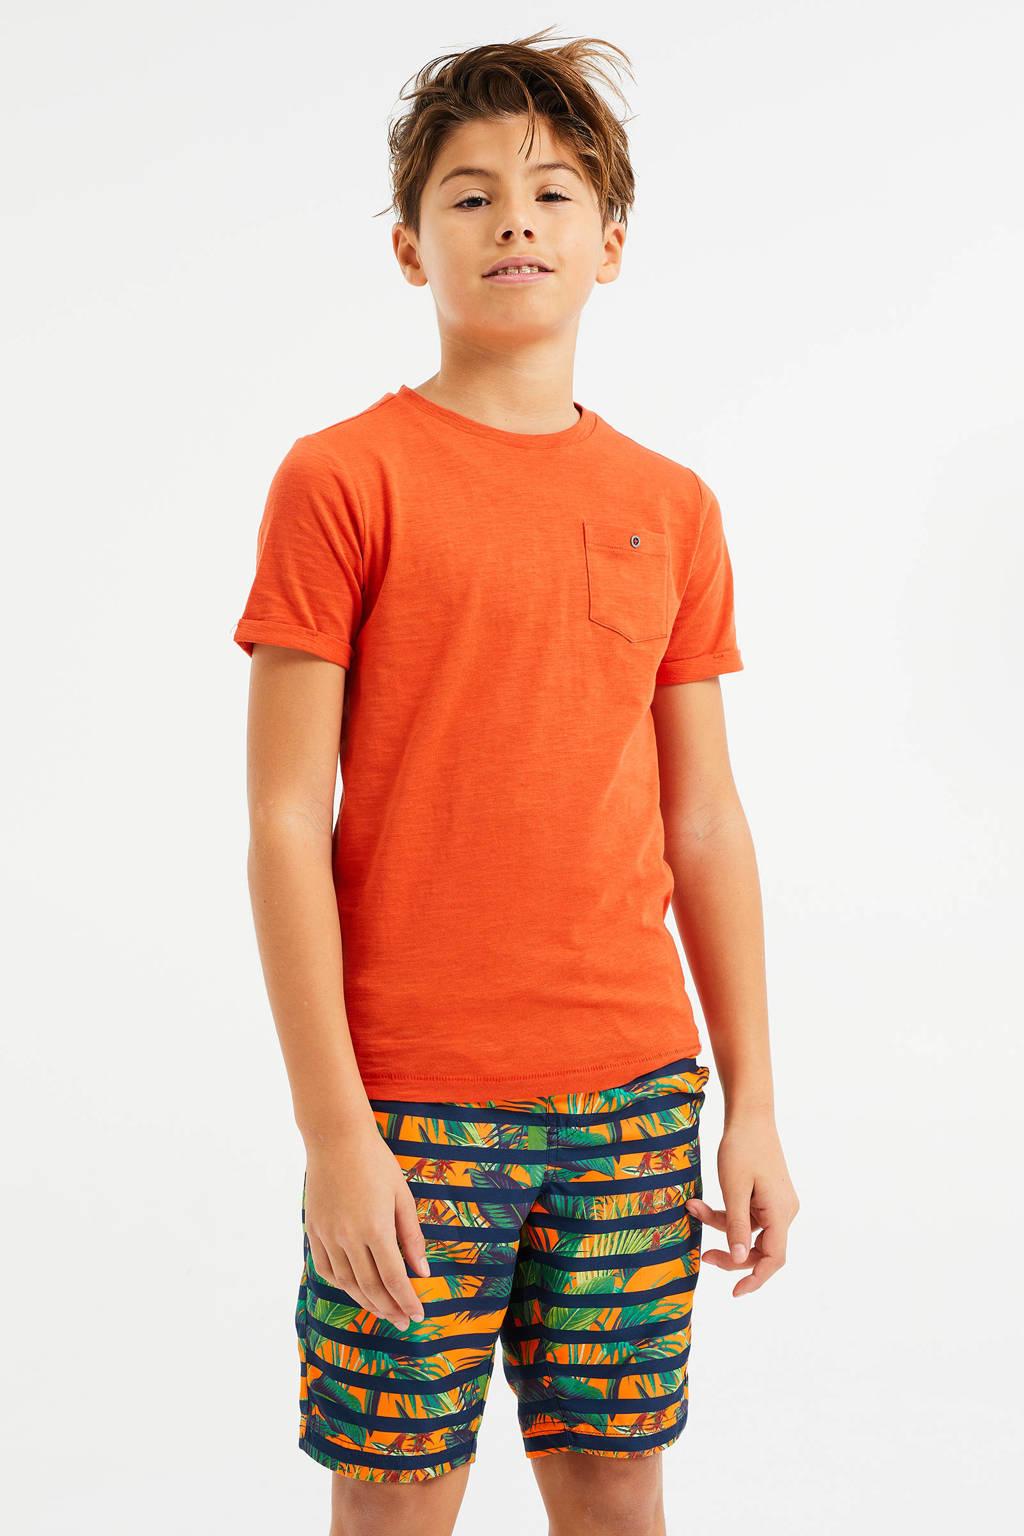 WE Fashion zwemshort met all over print oranje/groen, Oranje/groen